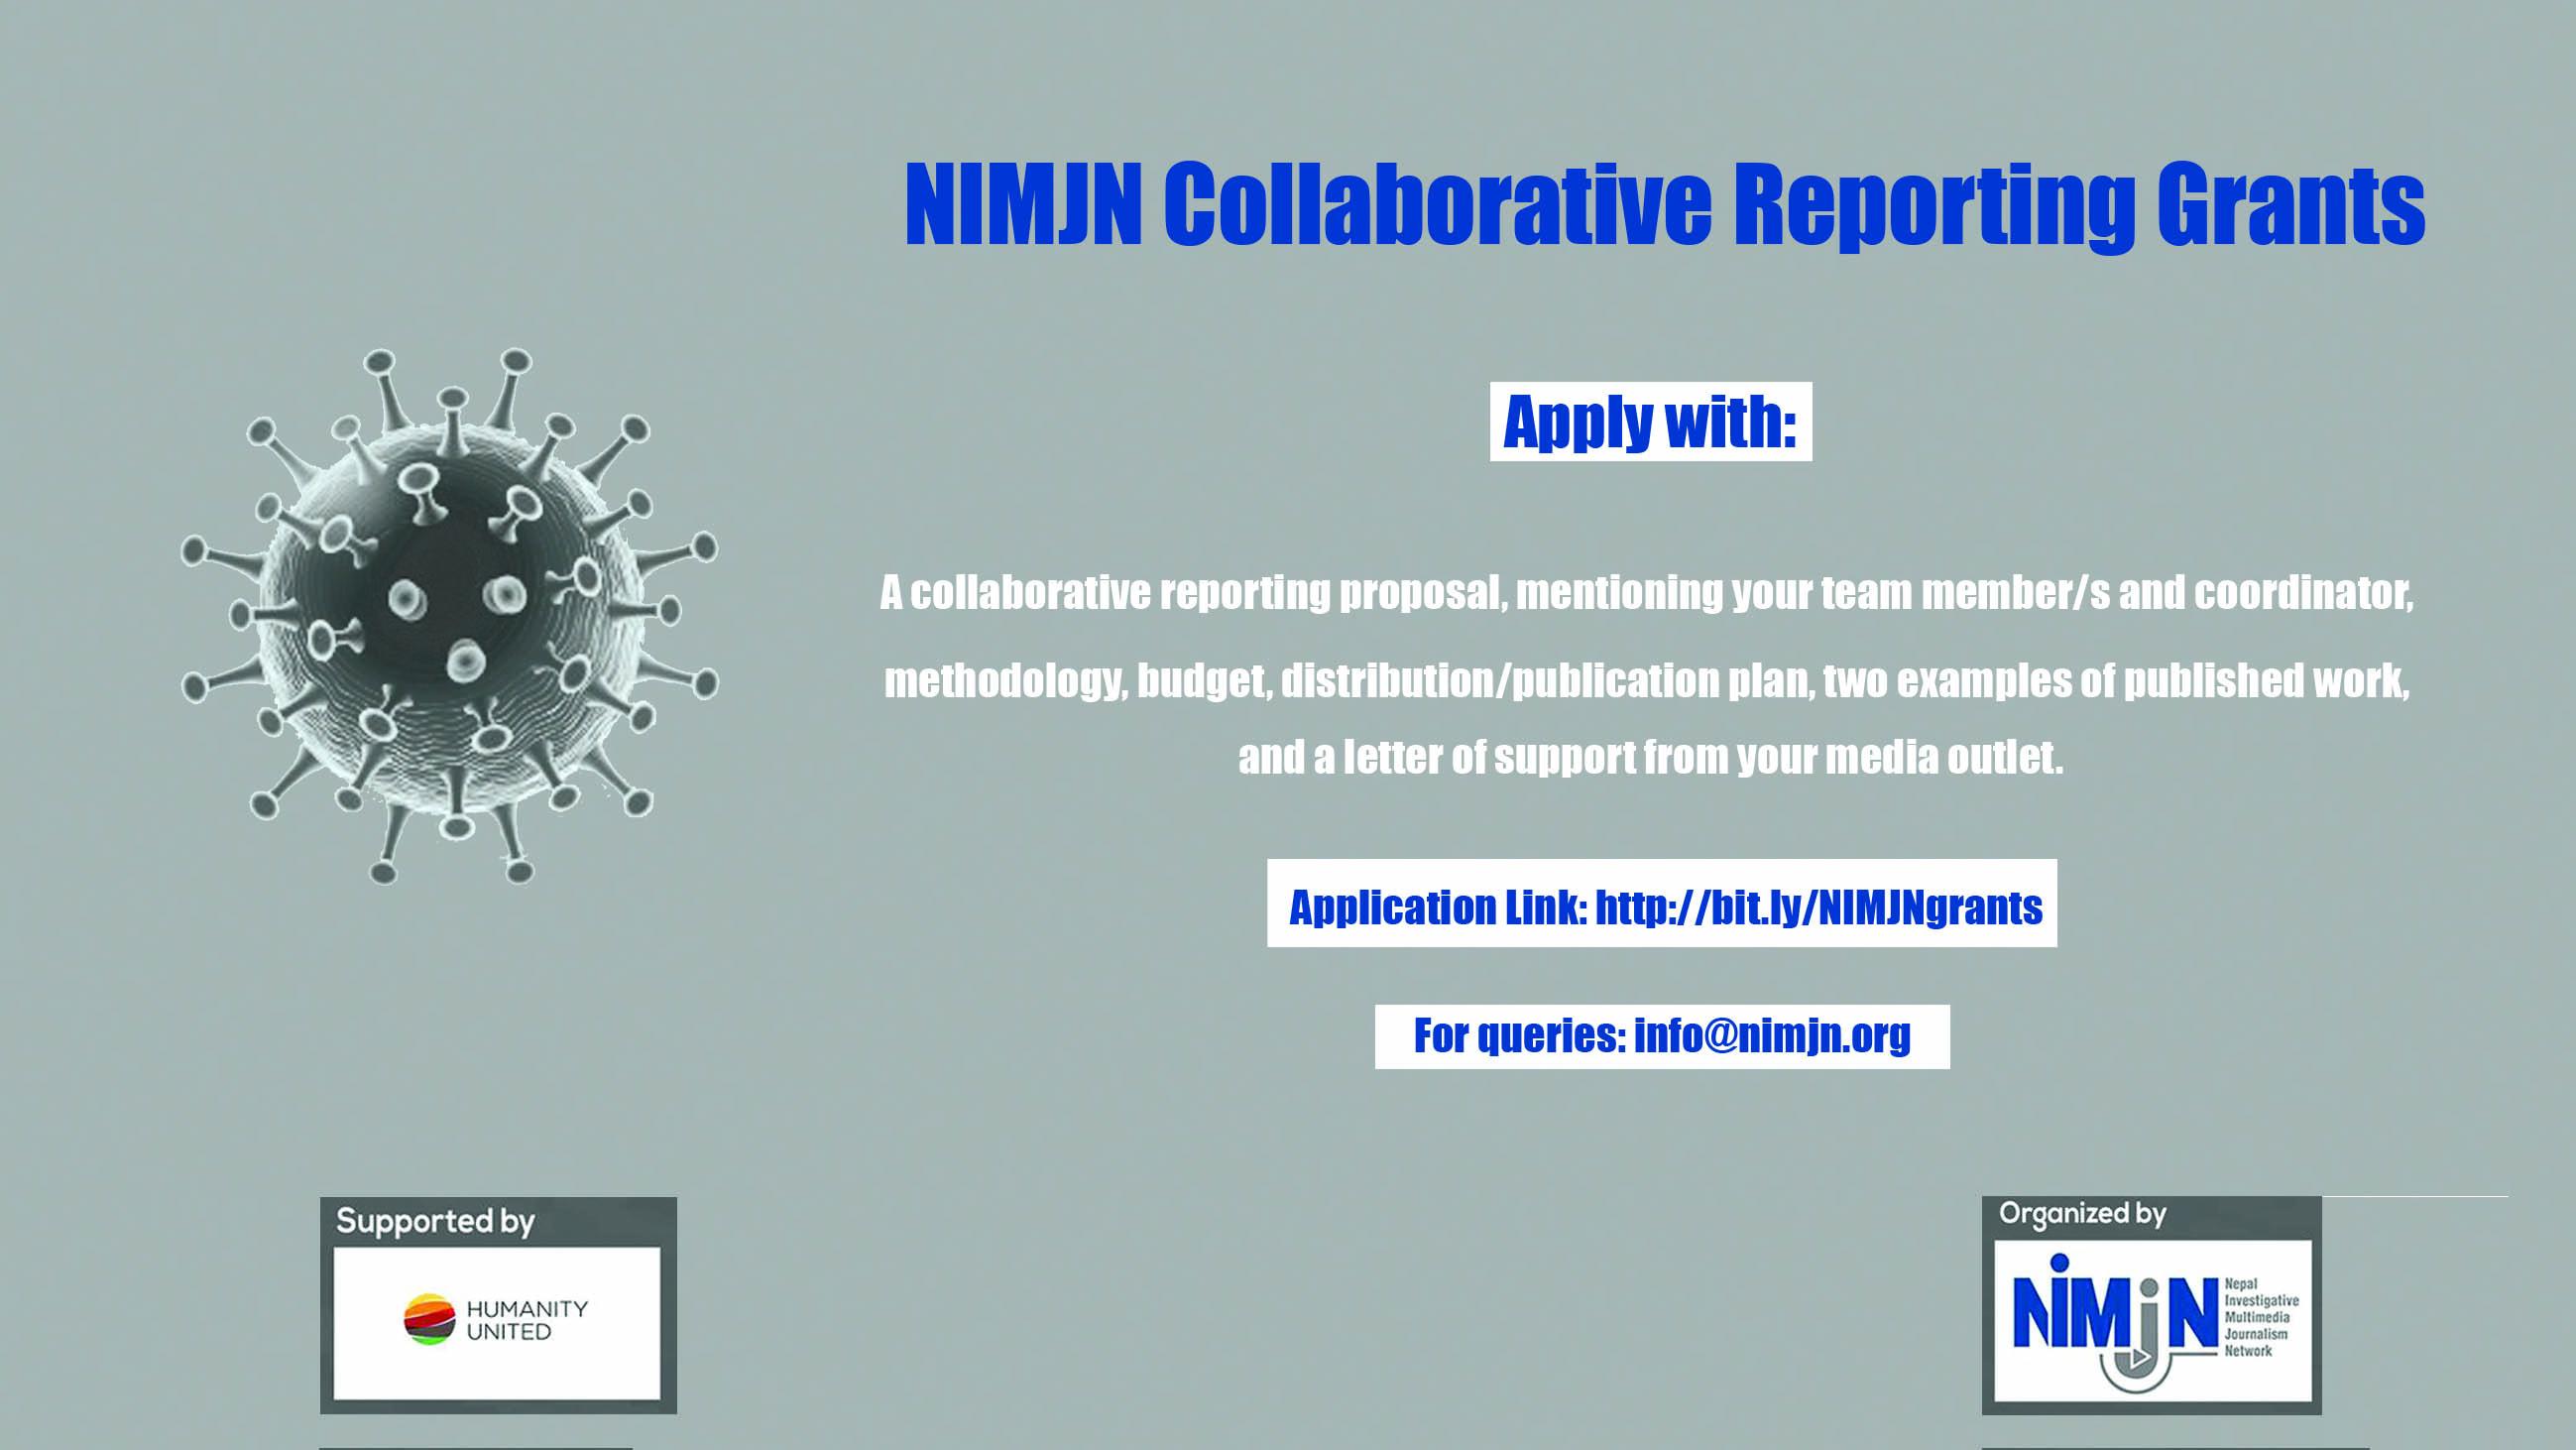 NIMJN Collaborative Reporting Grants